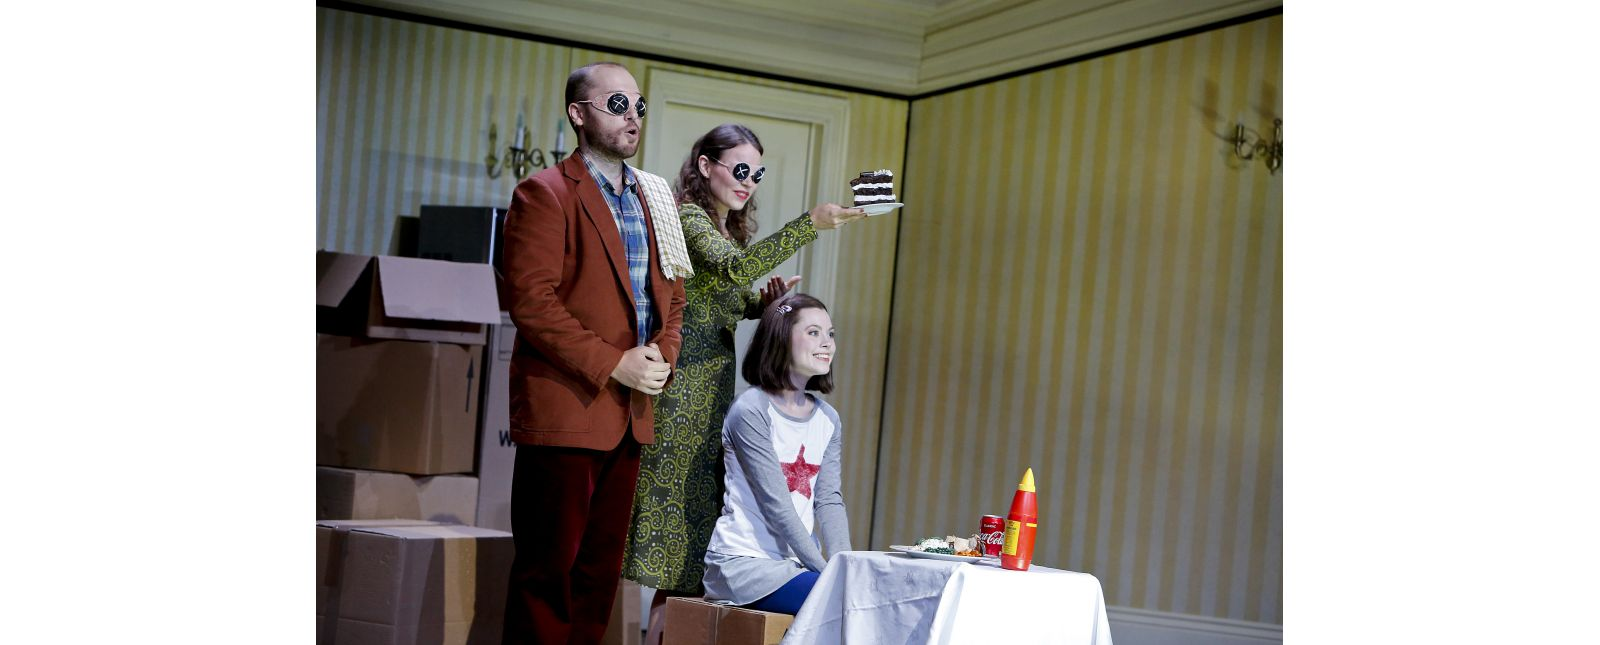 Coraline // John Carpenter // Inga Schäfer // Samantha Gaul // 2018 // Birgit Hupfeld